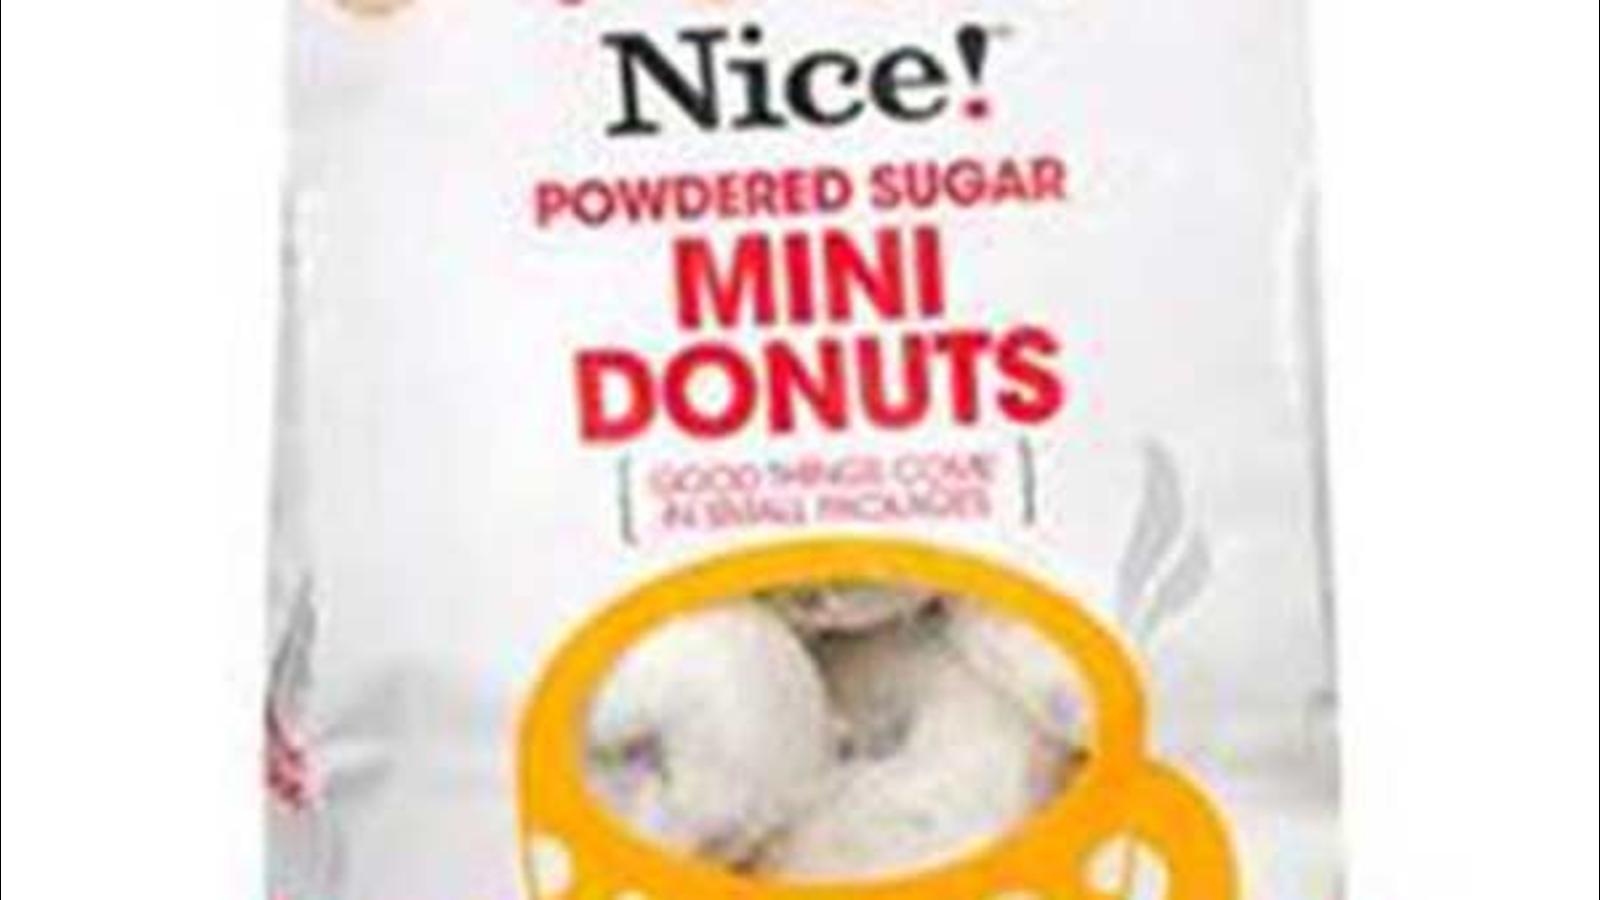 Walgreens recalls mini powdered doughnuts due to mold